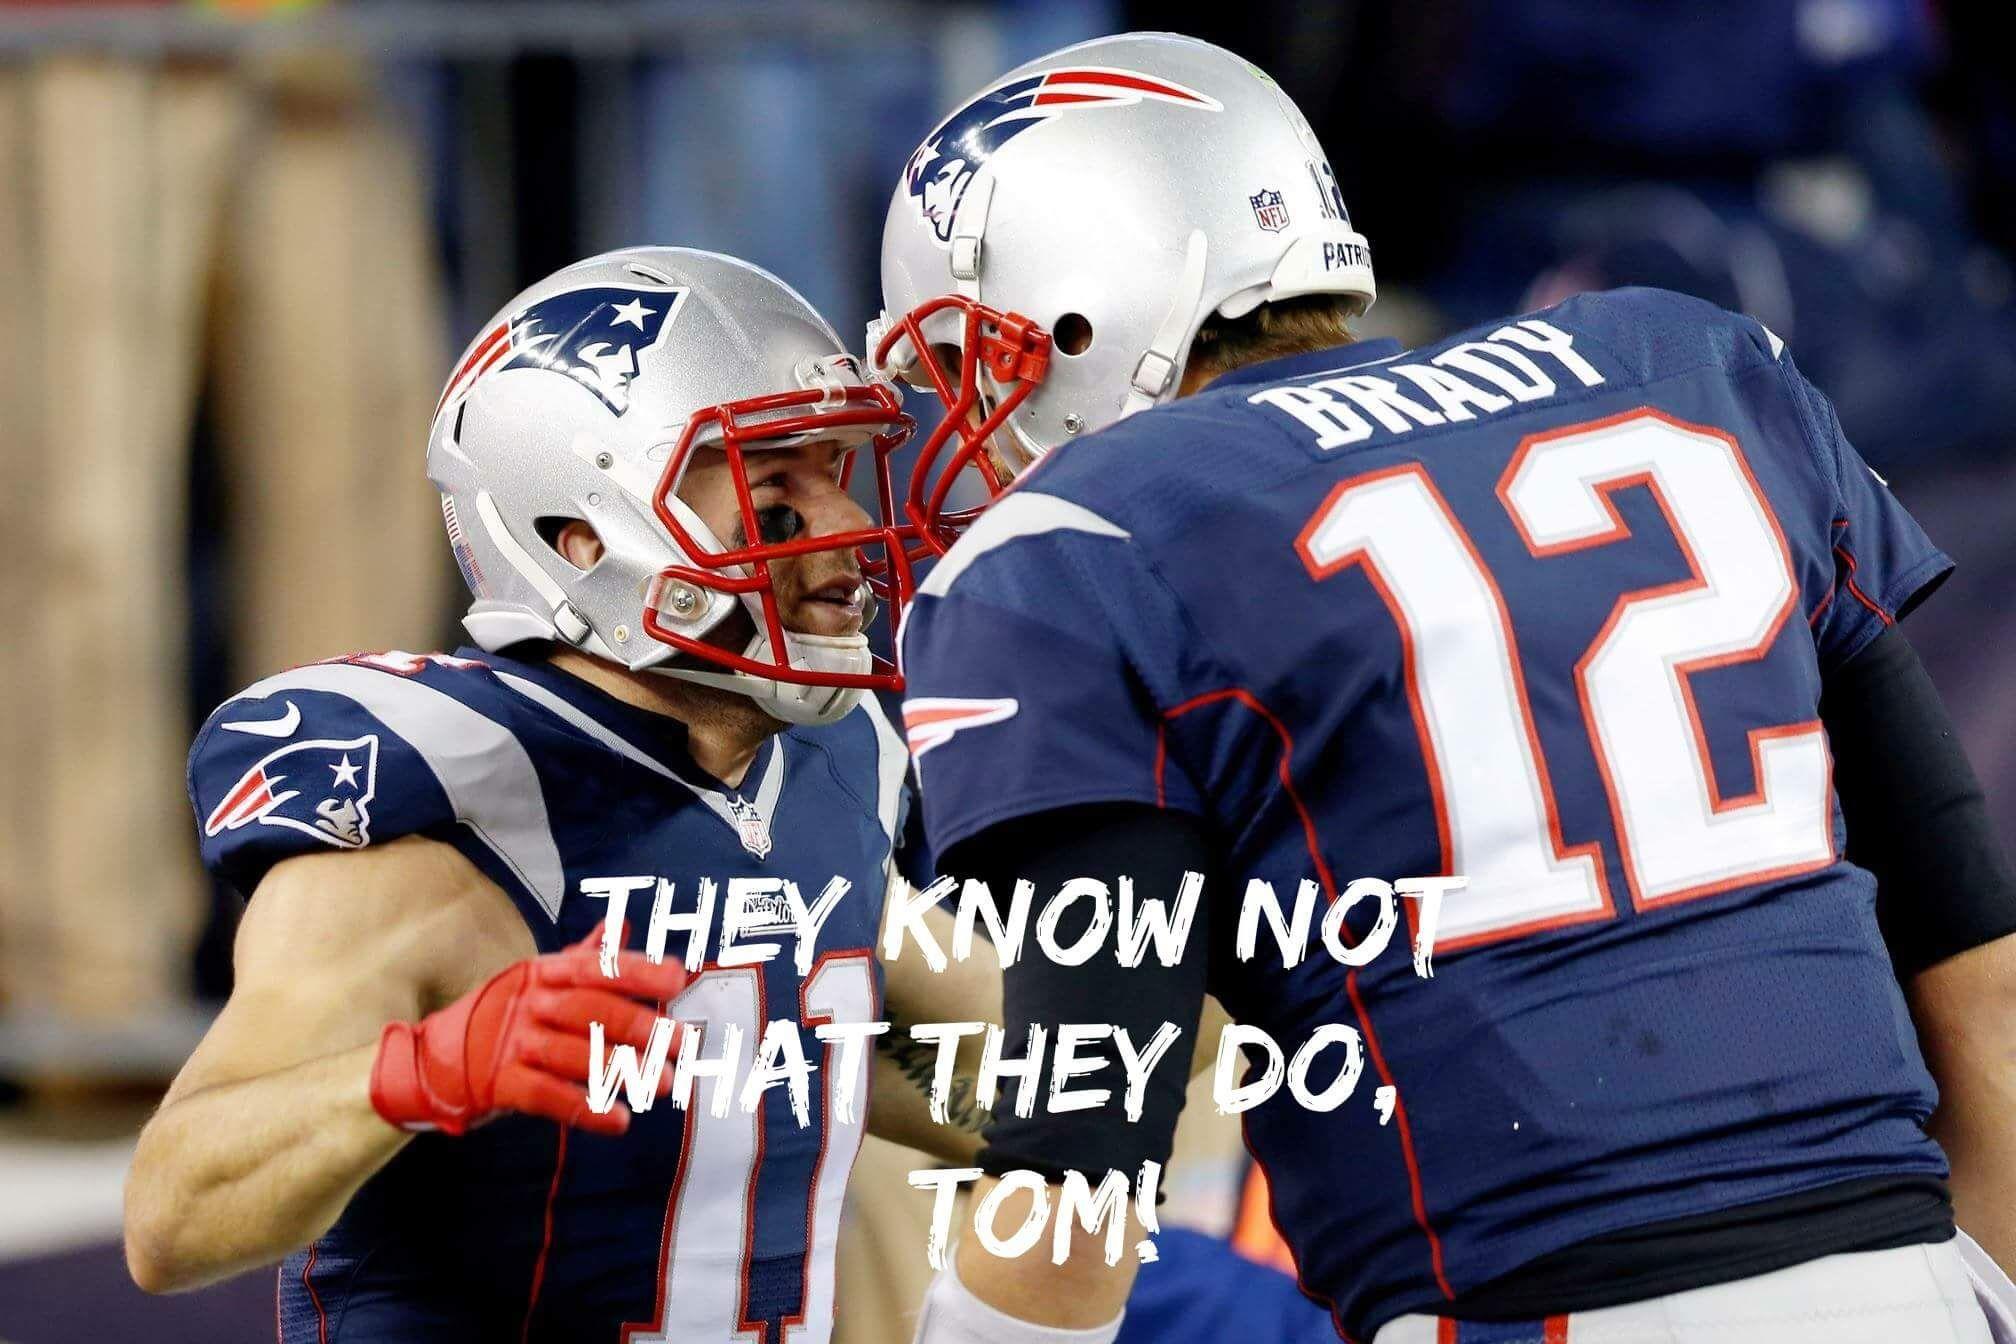 Pin By Kathy Quinn On The Pats New England Patriots Patriots Patriots Football